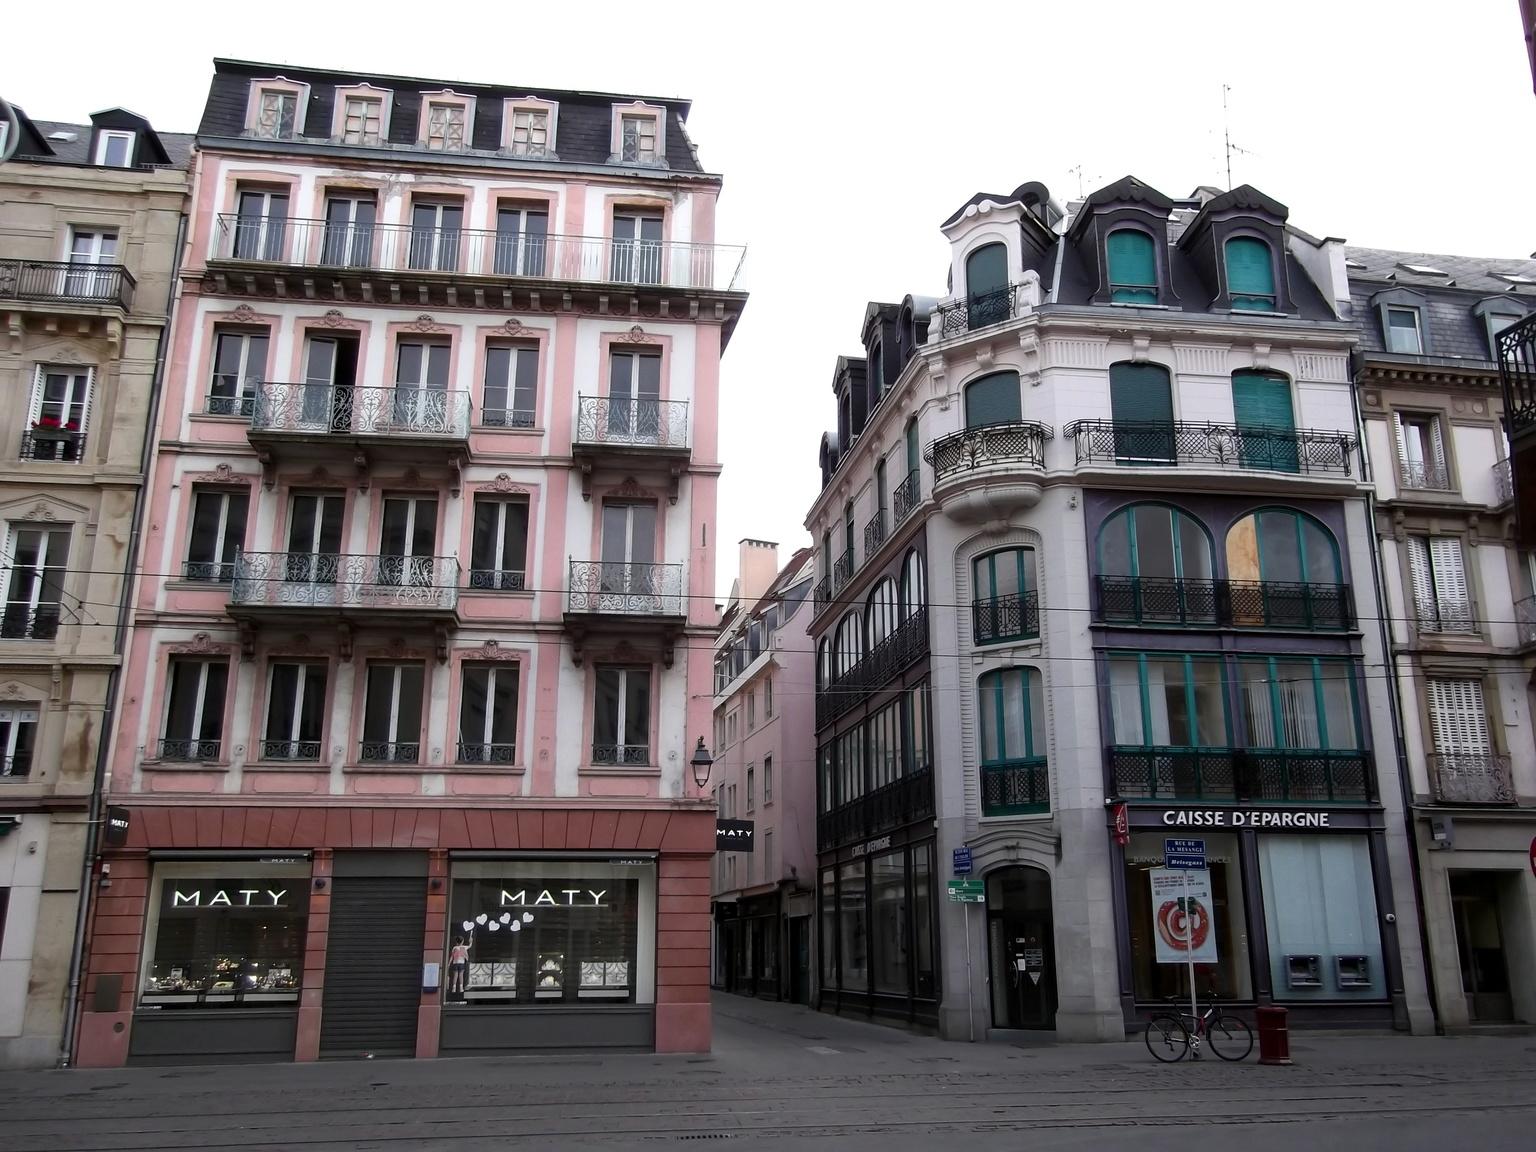 Maison Close Allemagne Proche Strasbourg Ventana Blog